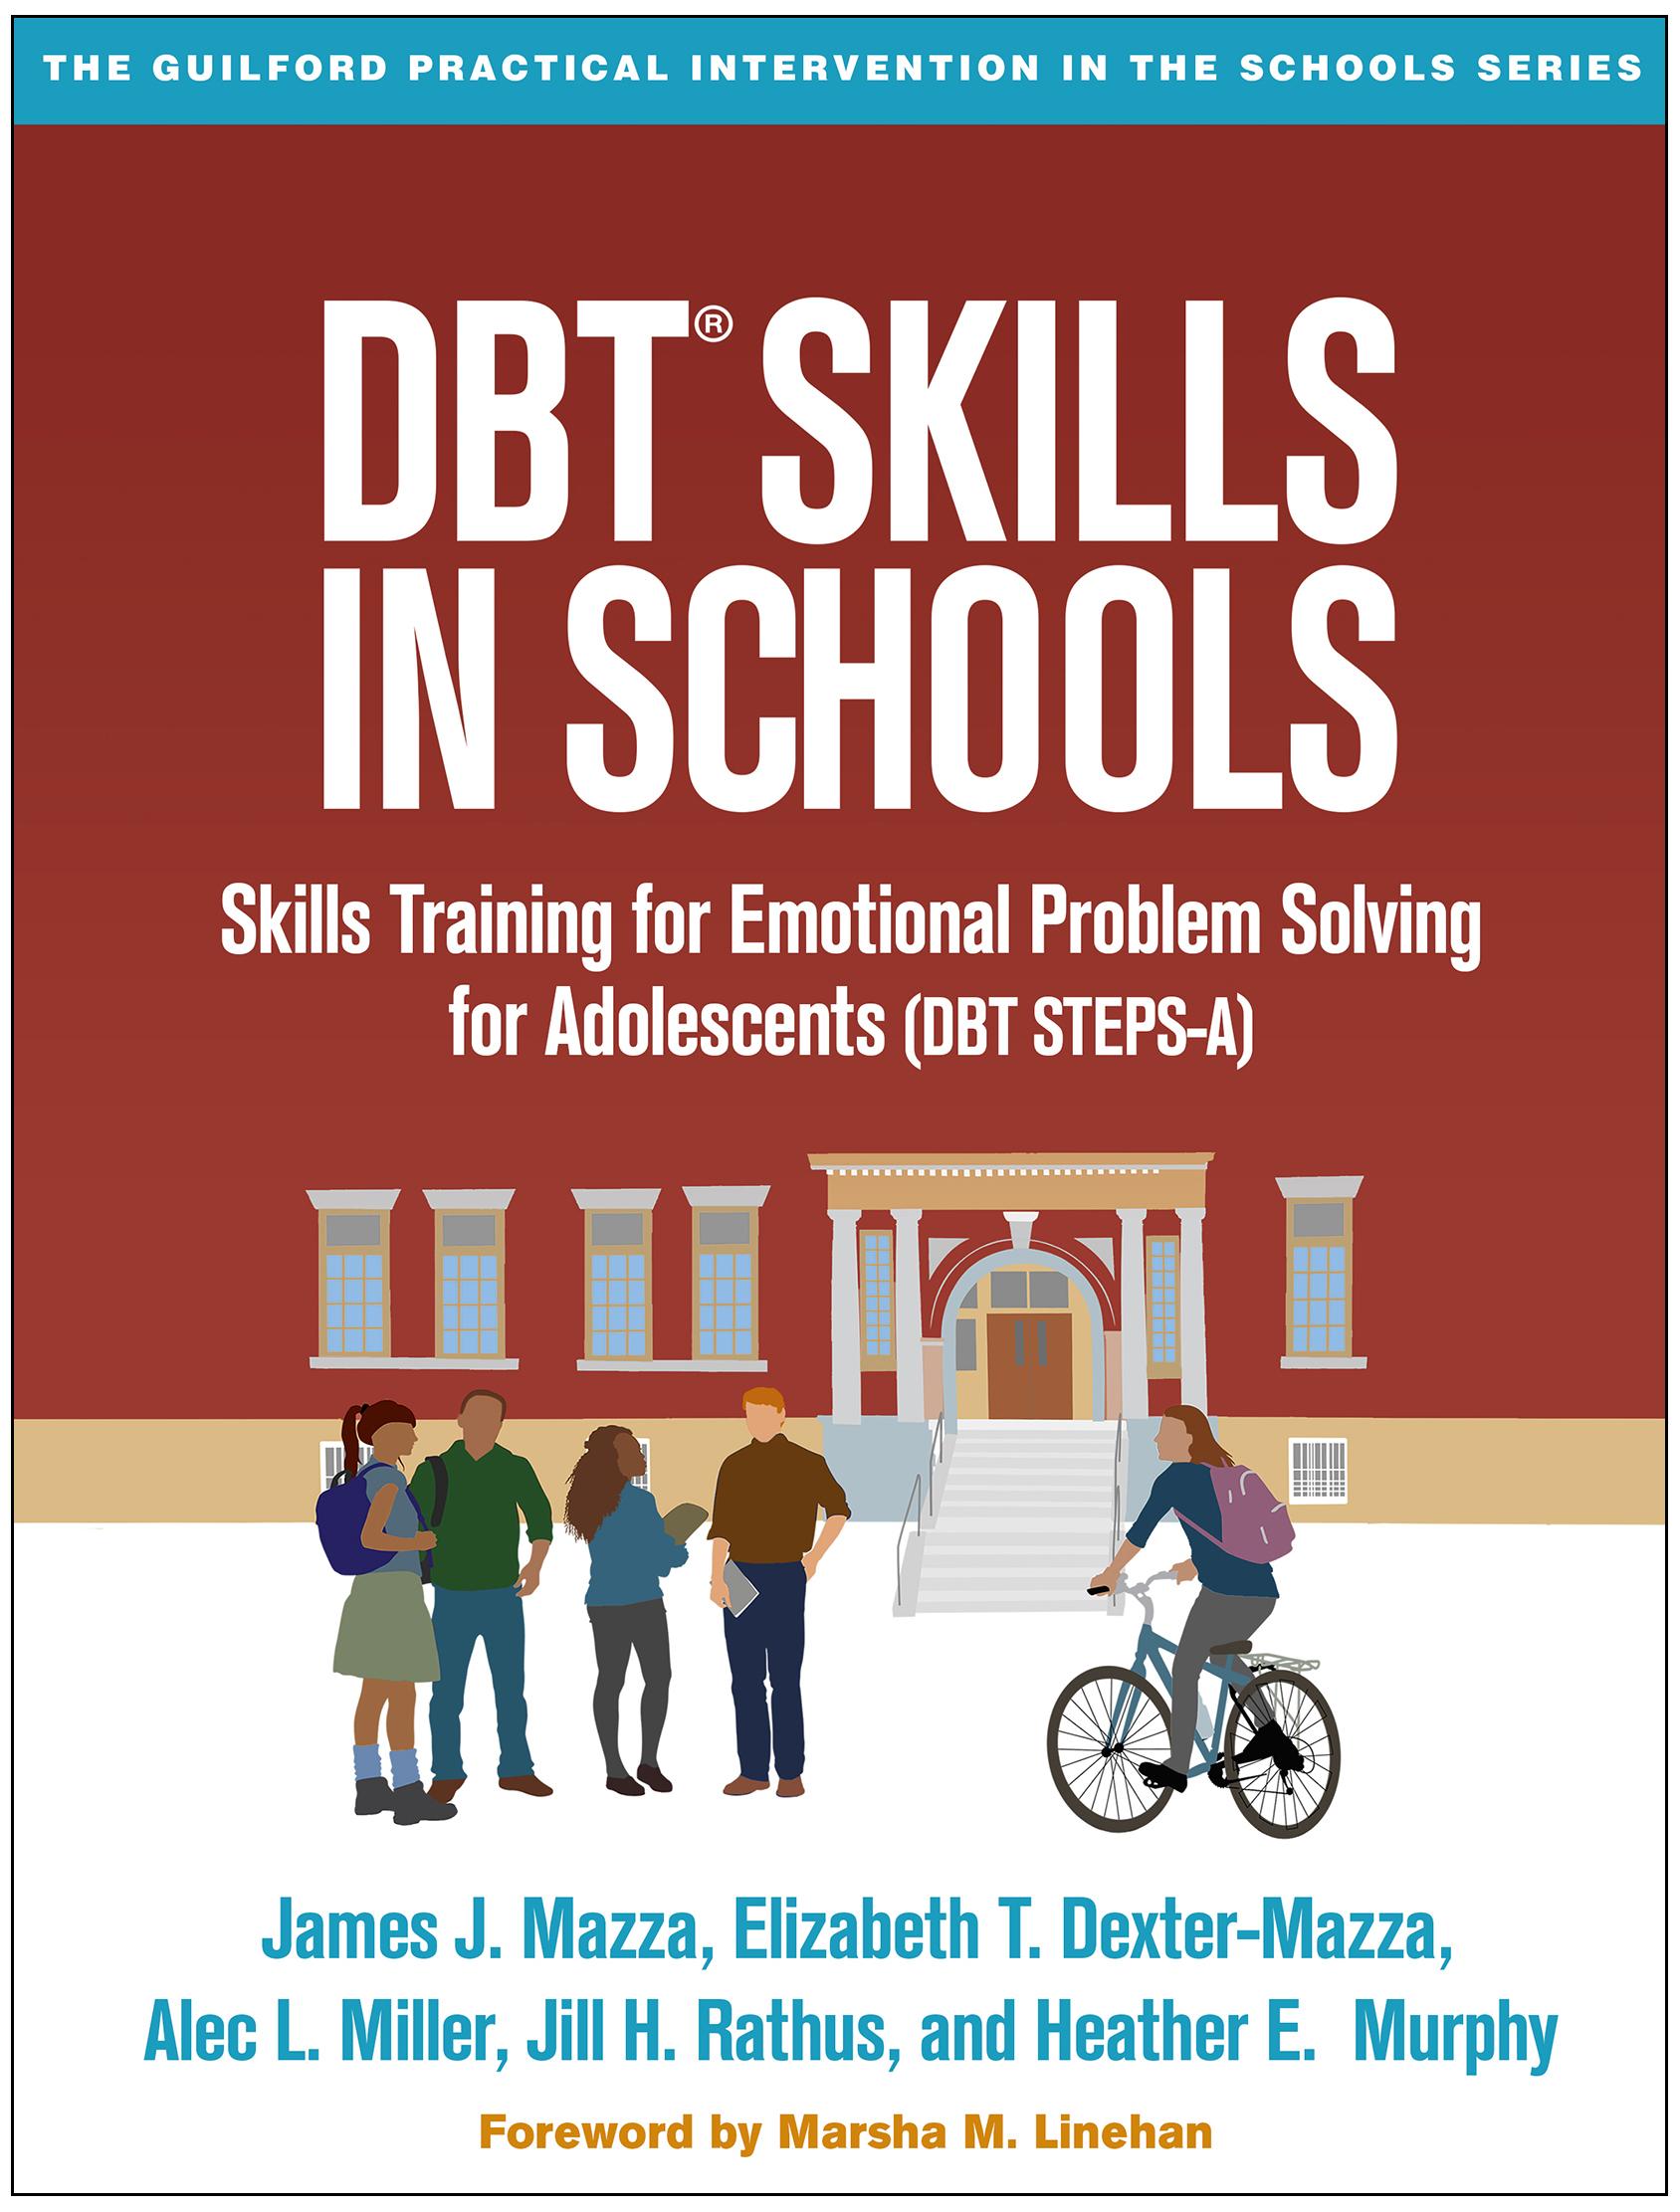 DBT-Skills-in-Schools-Skills-Training-for-Emotional-Problem-Solving-for-Adolescents-DBT-STEPS-A-